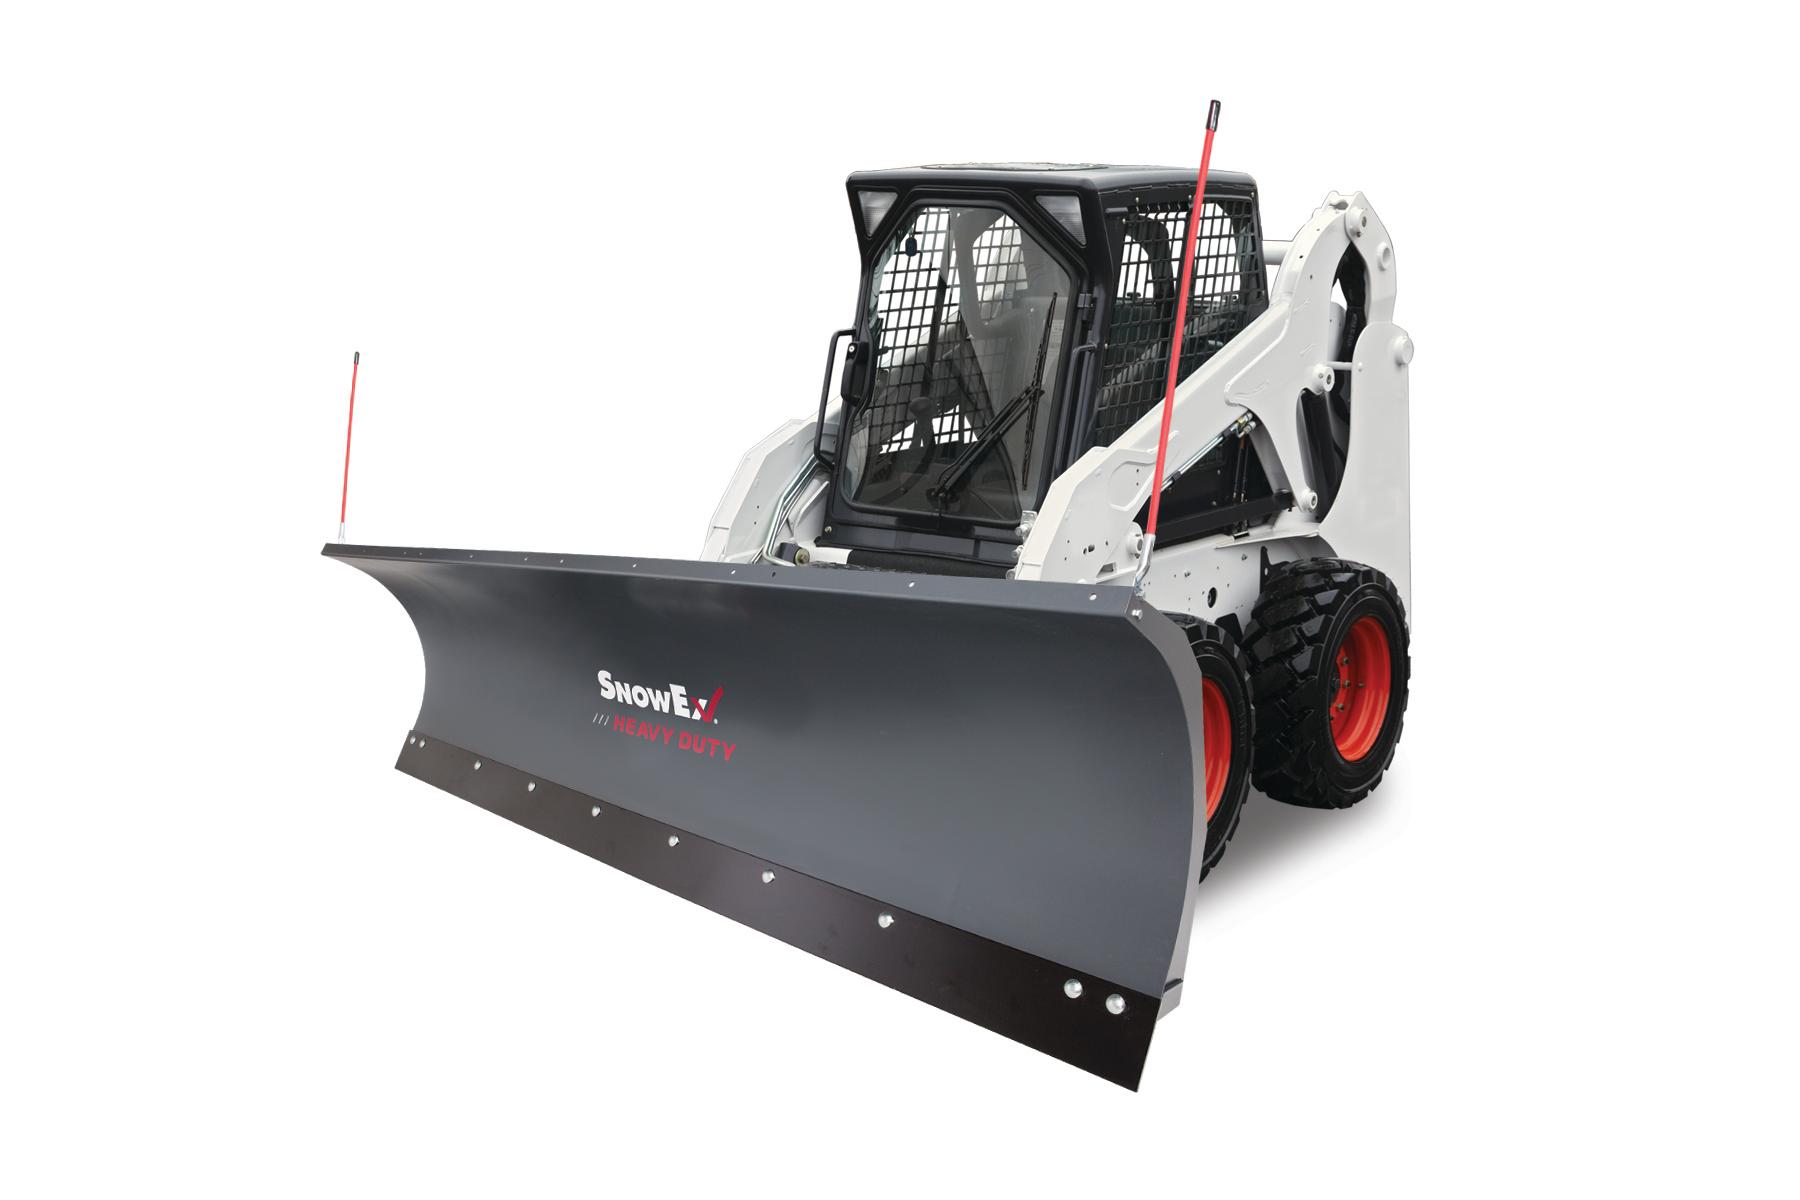 SnowEx heavy-duty snowplow